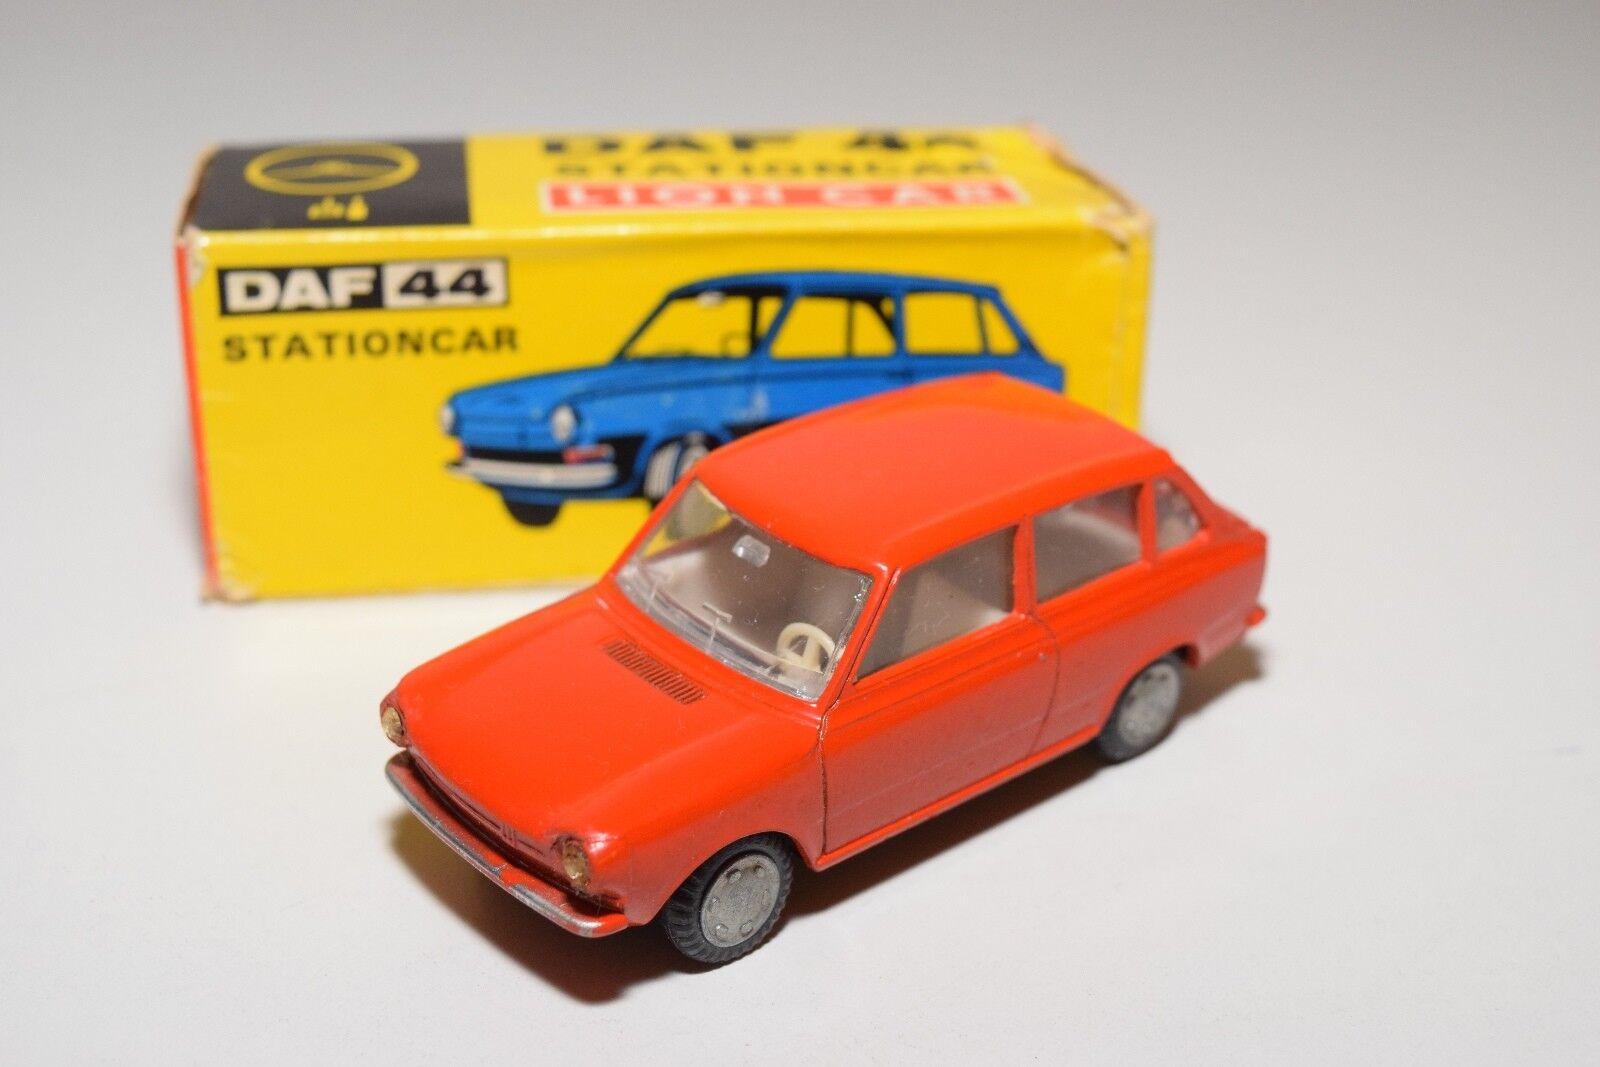 LION CAR DAF 44 CAR STATIONCAR WAGON  Rojo-Naranja NEAR MINT BOXED